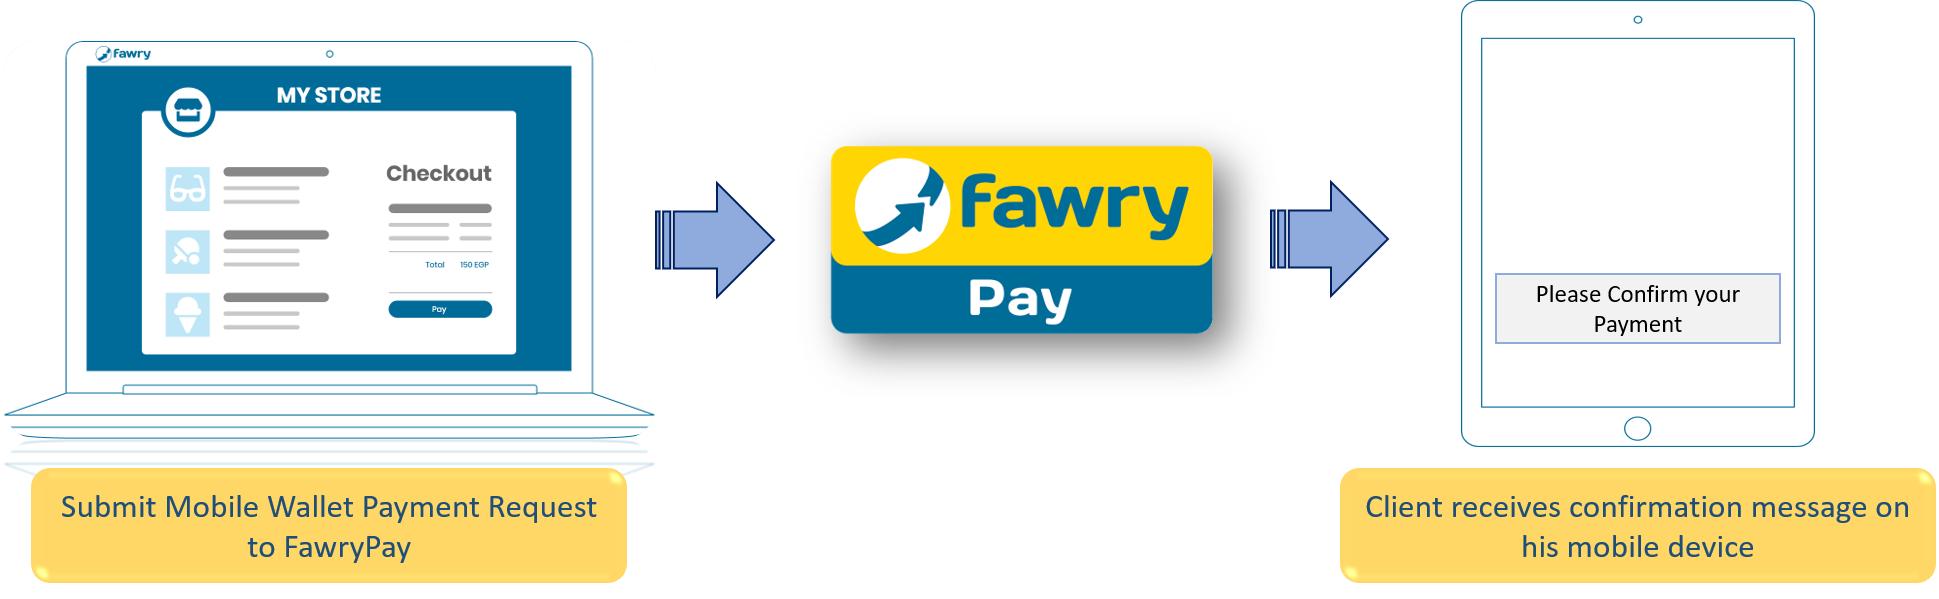 R2P wallet payment flow